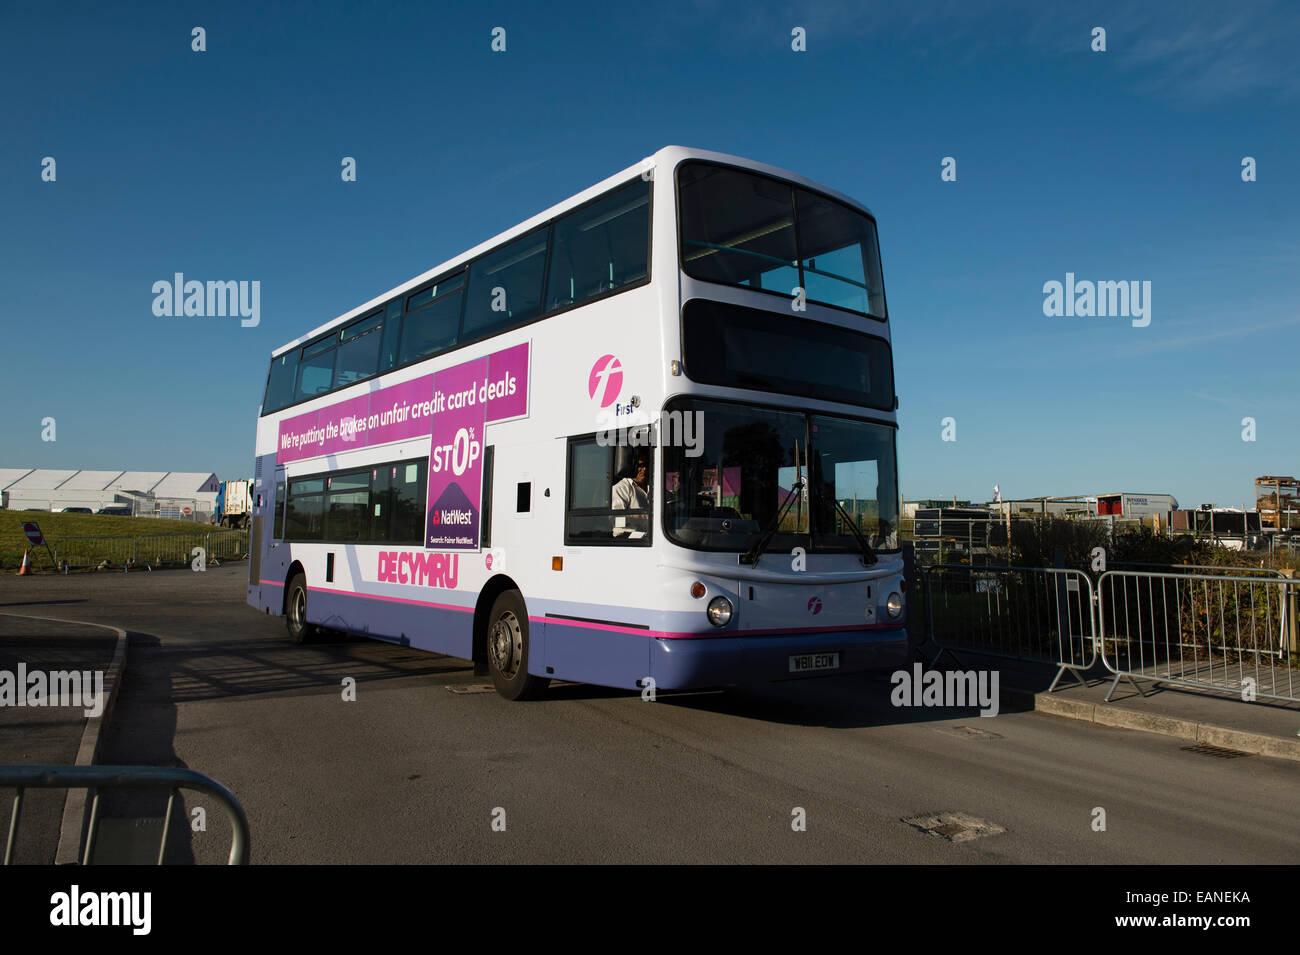 a double decker first south wales shuttle bus at the national a double decker first south wales shuttle bus at the national eisteddfod of wales llanelli 2014